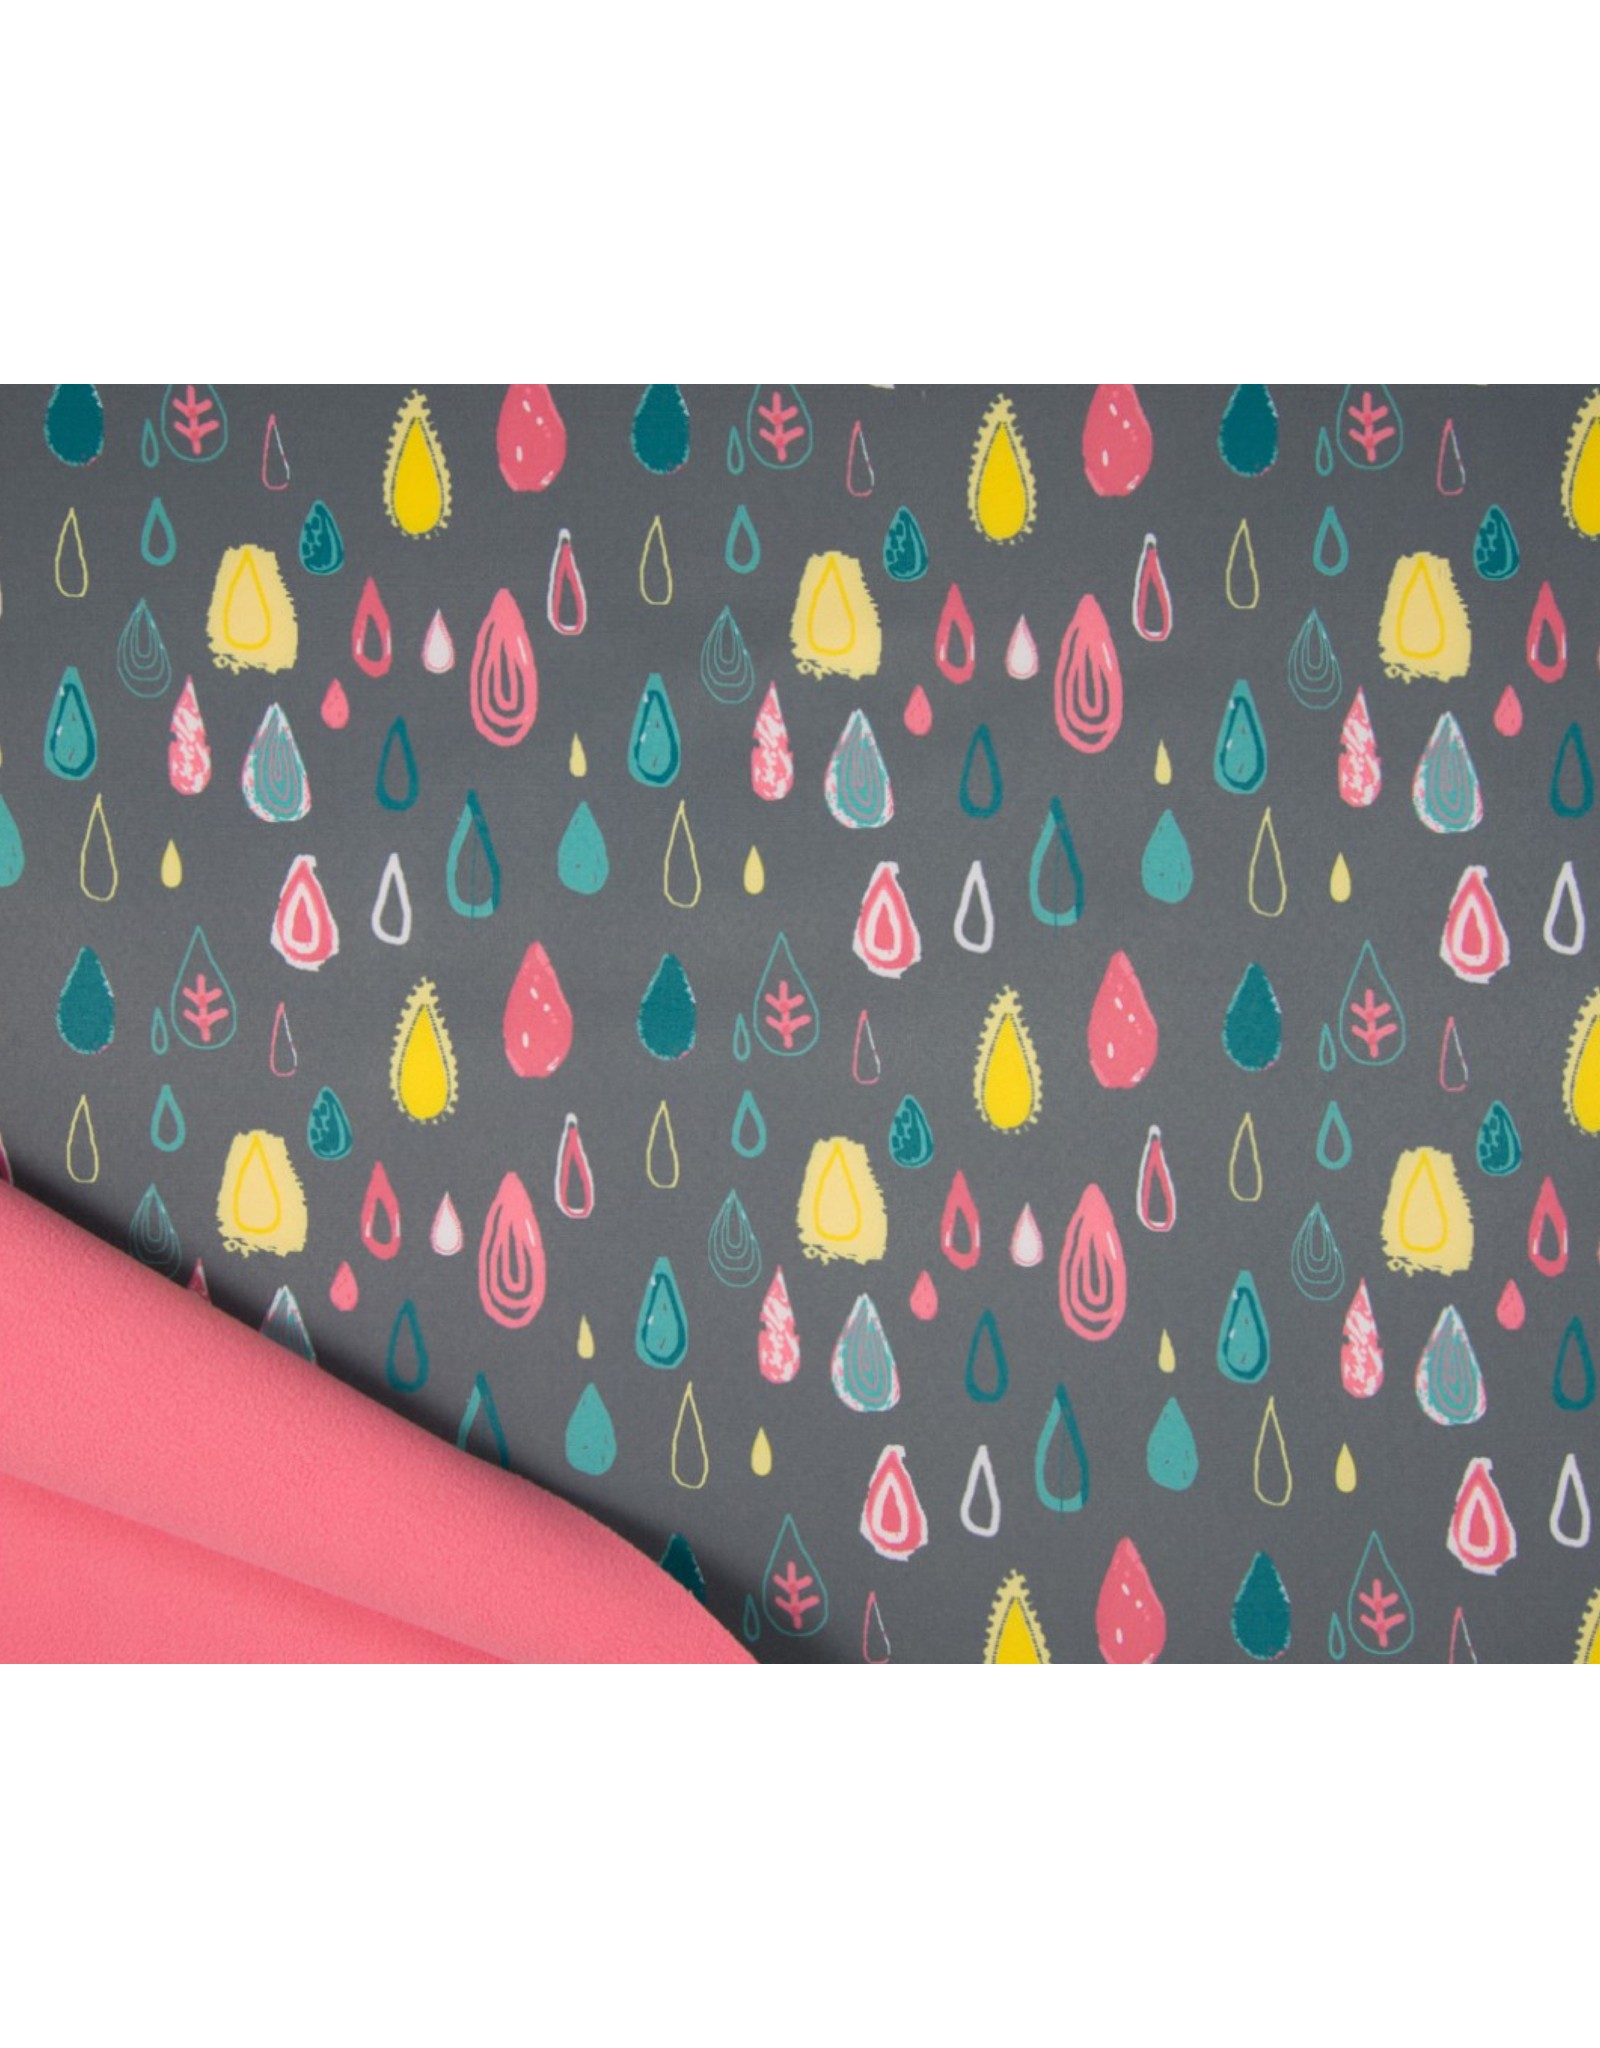 Softshell stoff Bedruckt - Raindrops Grau